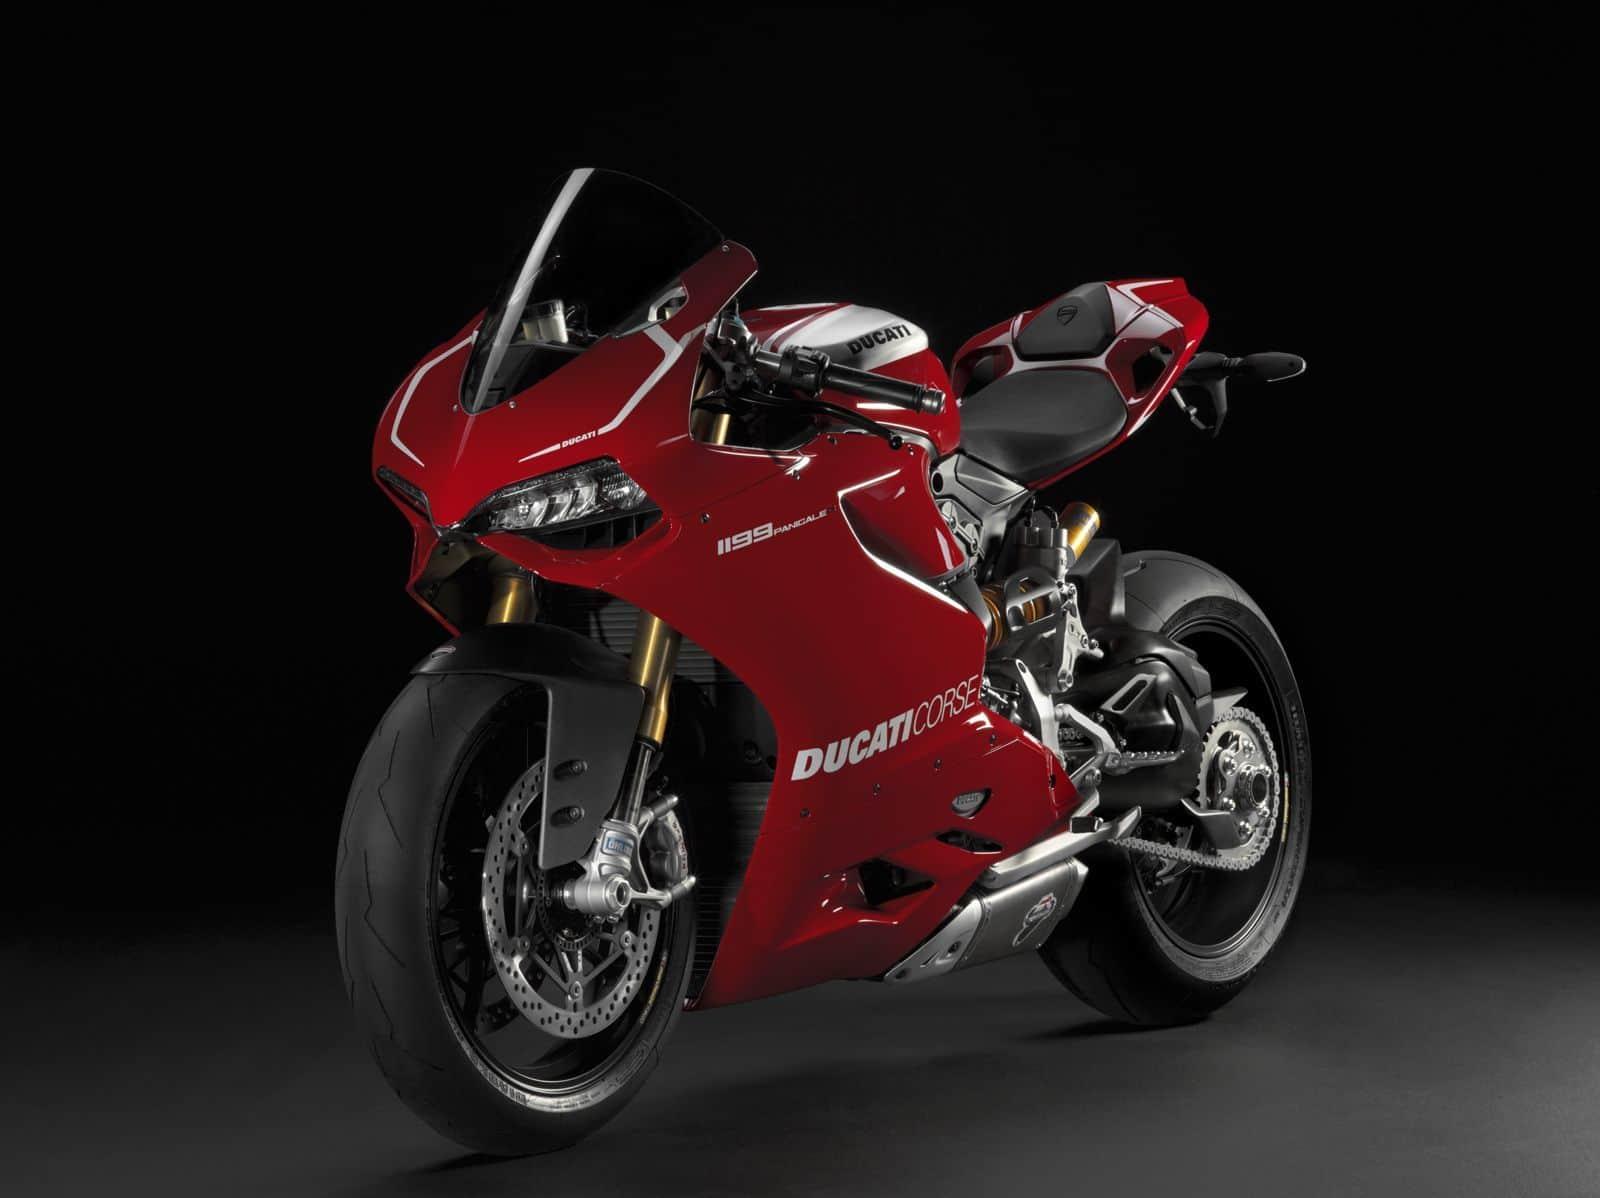 The wonderful 2013 Ducati 1199 Panigale R